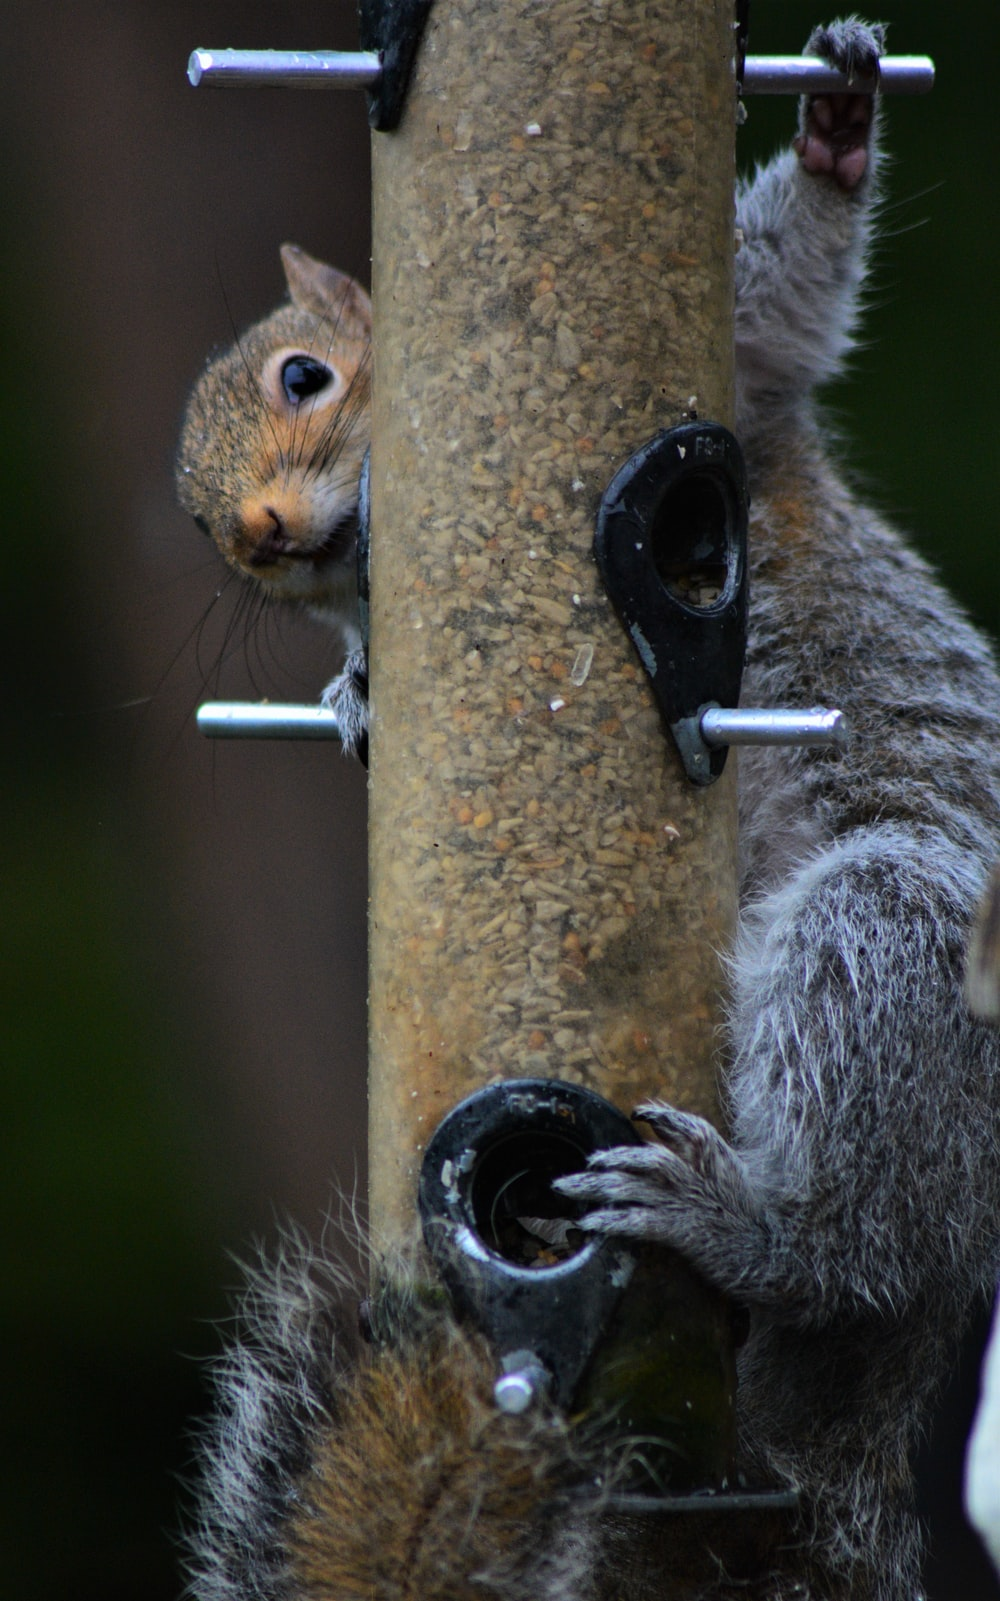 brown squirrel on brown wooden stick during daytime